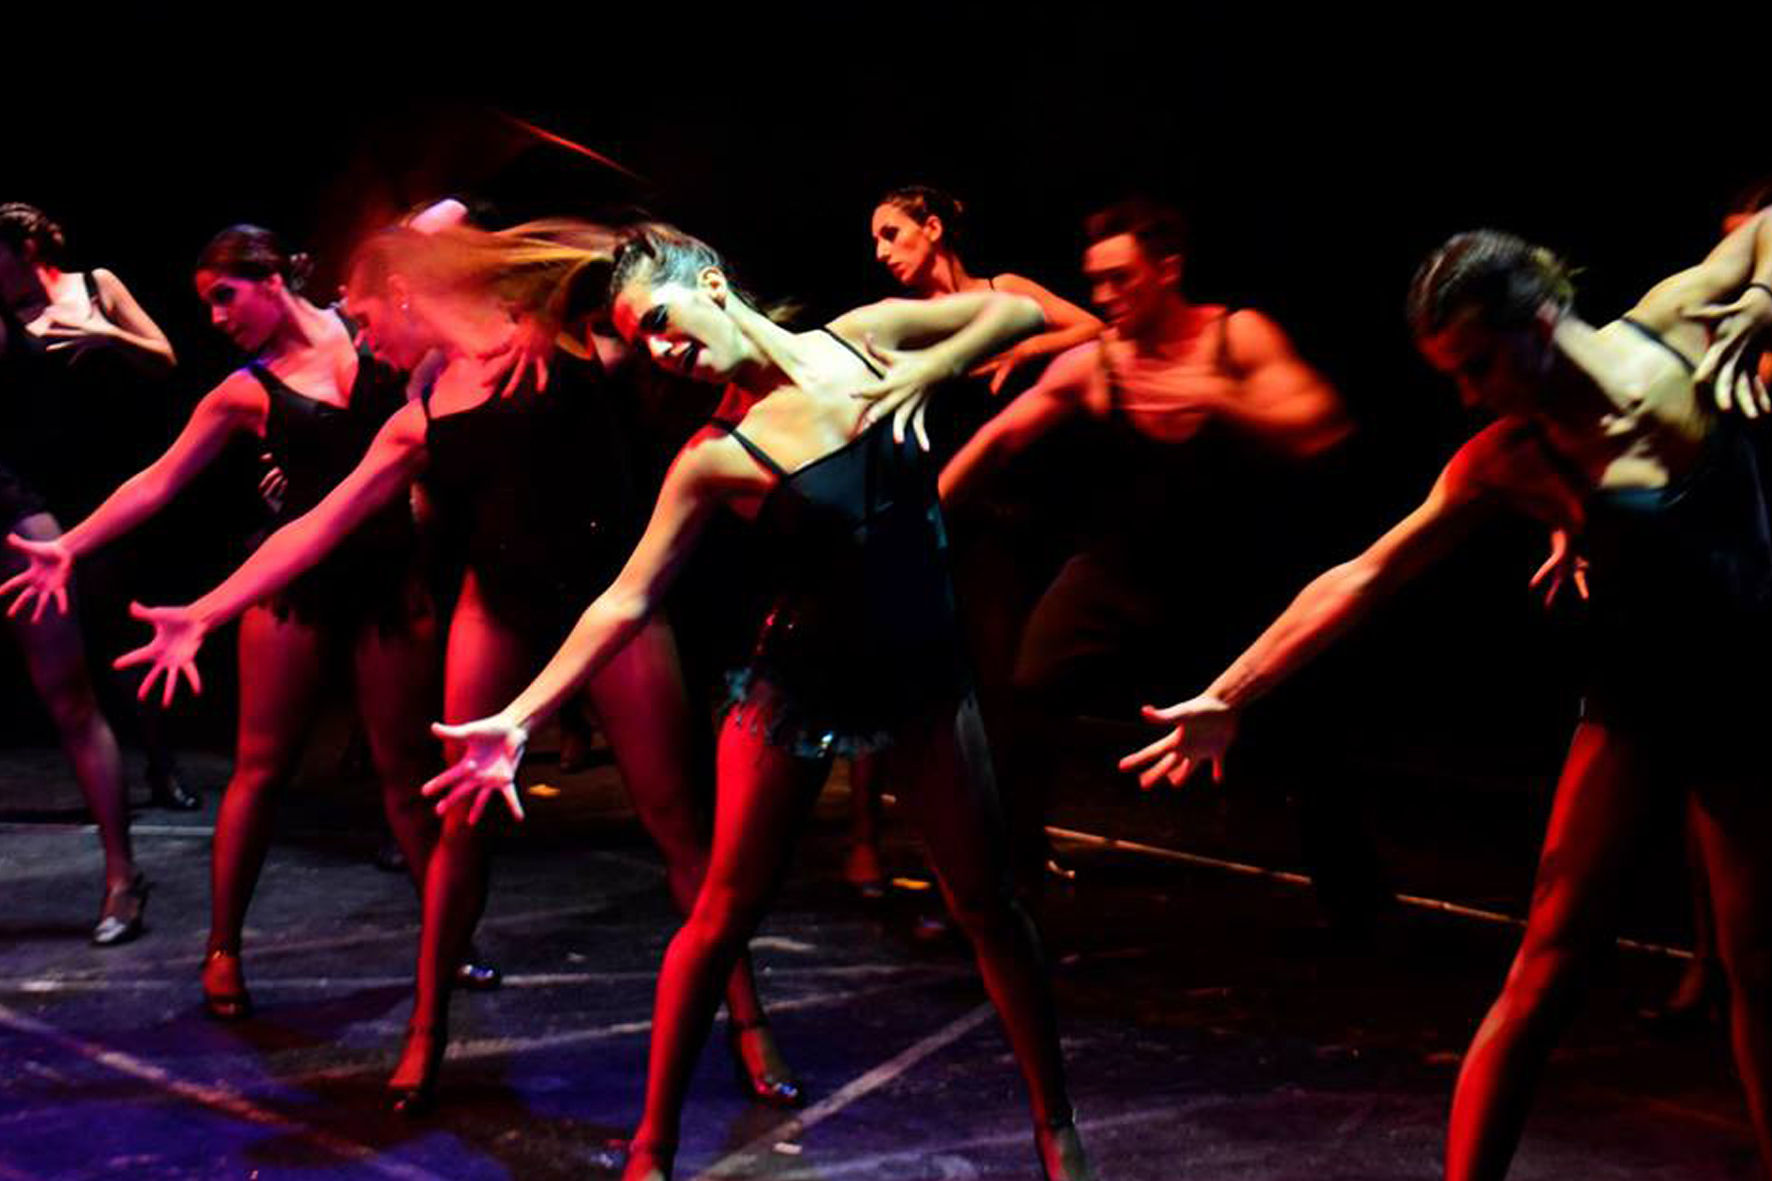 danza theatre dance jazz swing charleston bale evento show